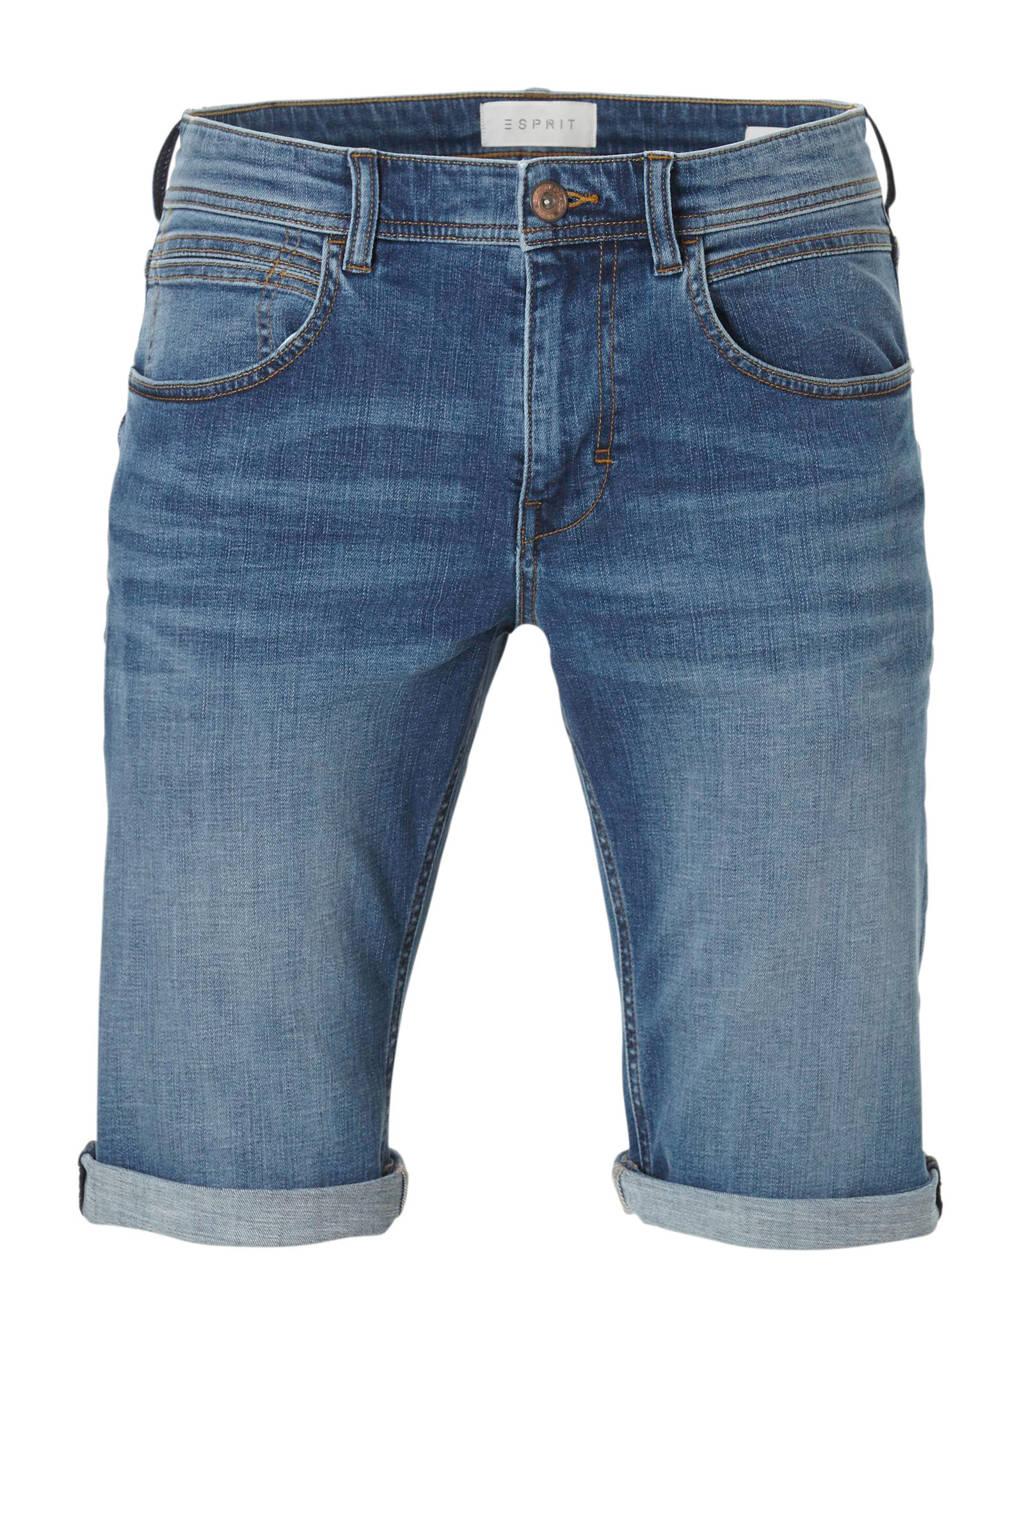 ESPRIT Men Casual slim fit jeans short, Dark denim